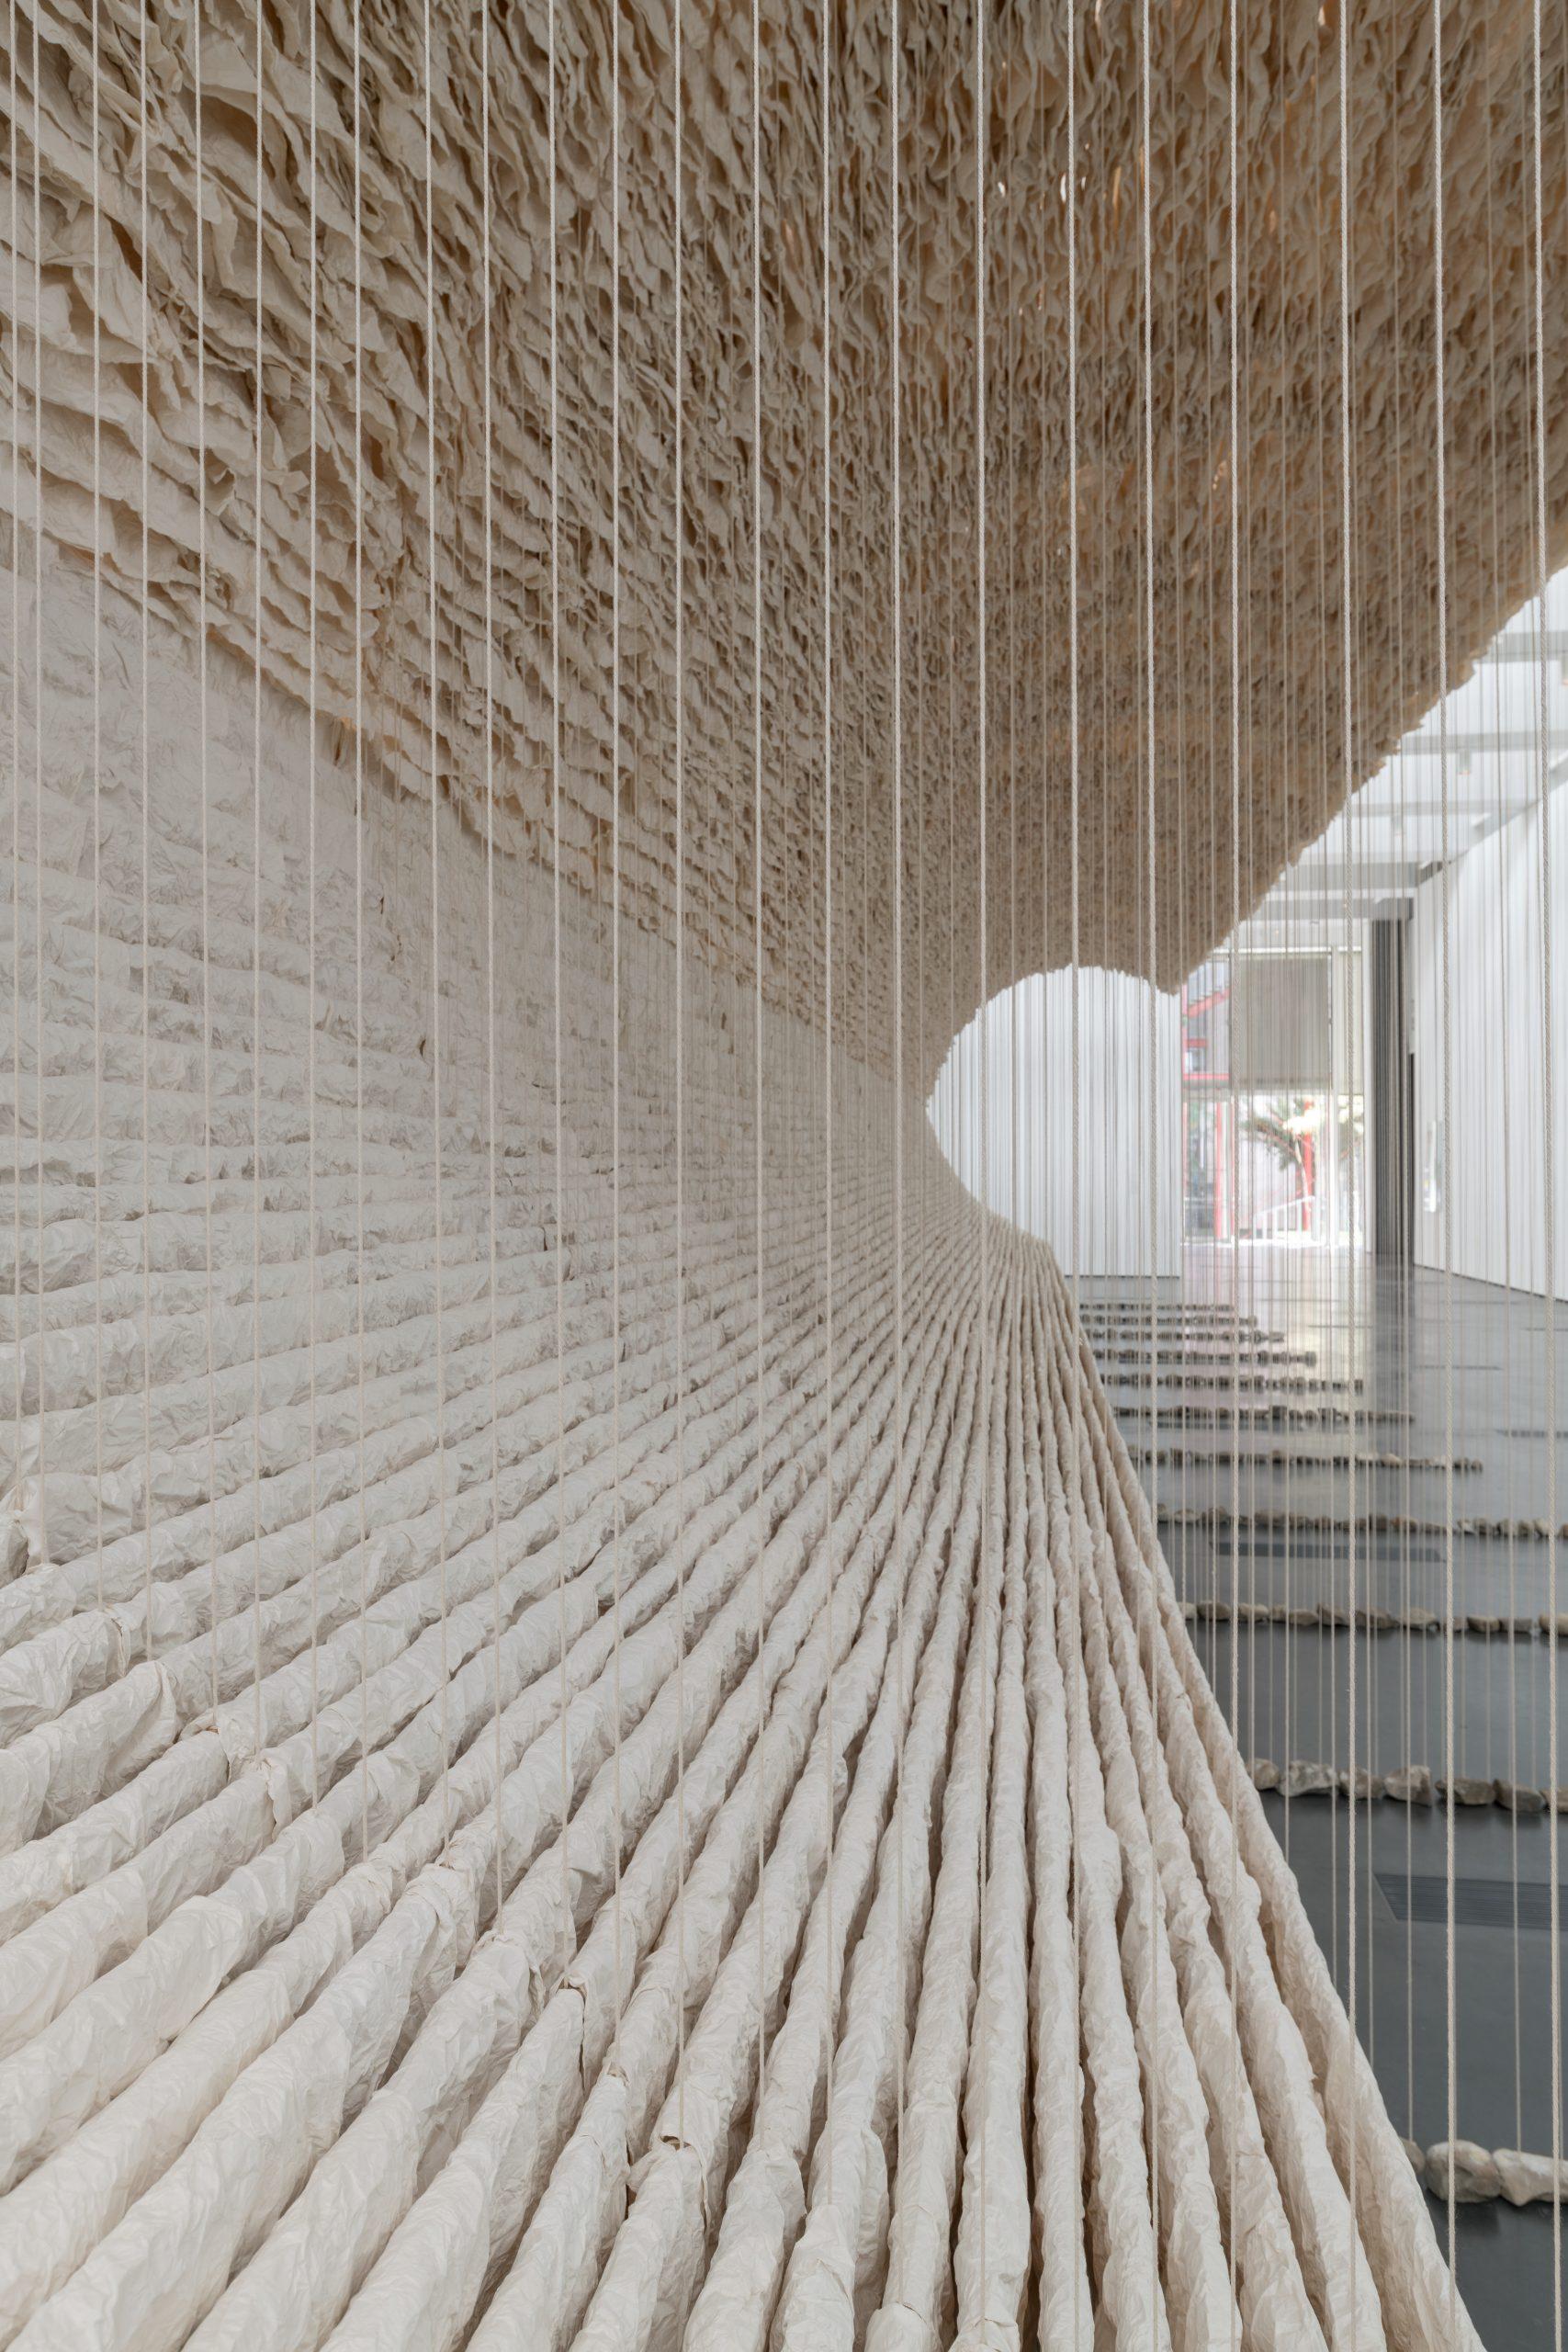 Zhu Jinshi, Wave of Materials, 2007/2020. Detail. Photo courtesy of © Museum Associates/LACMA.